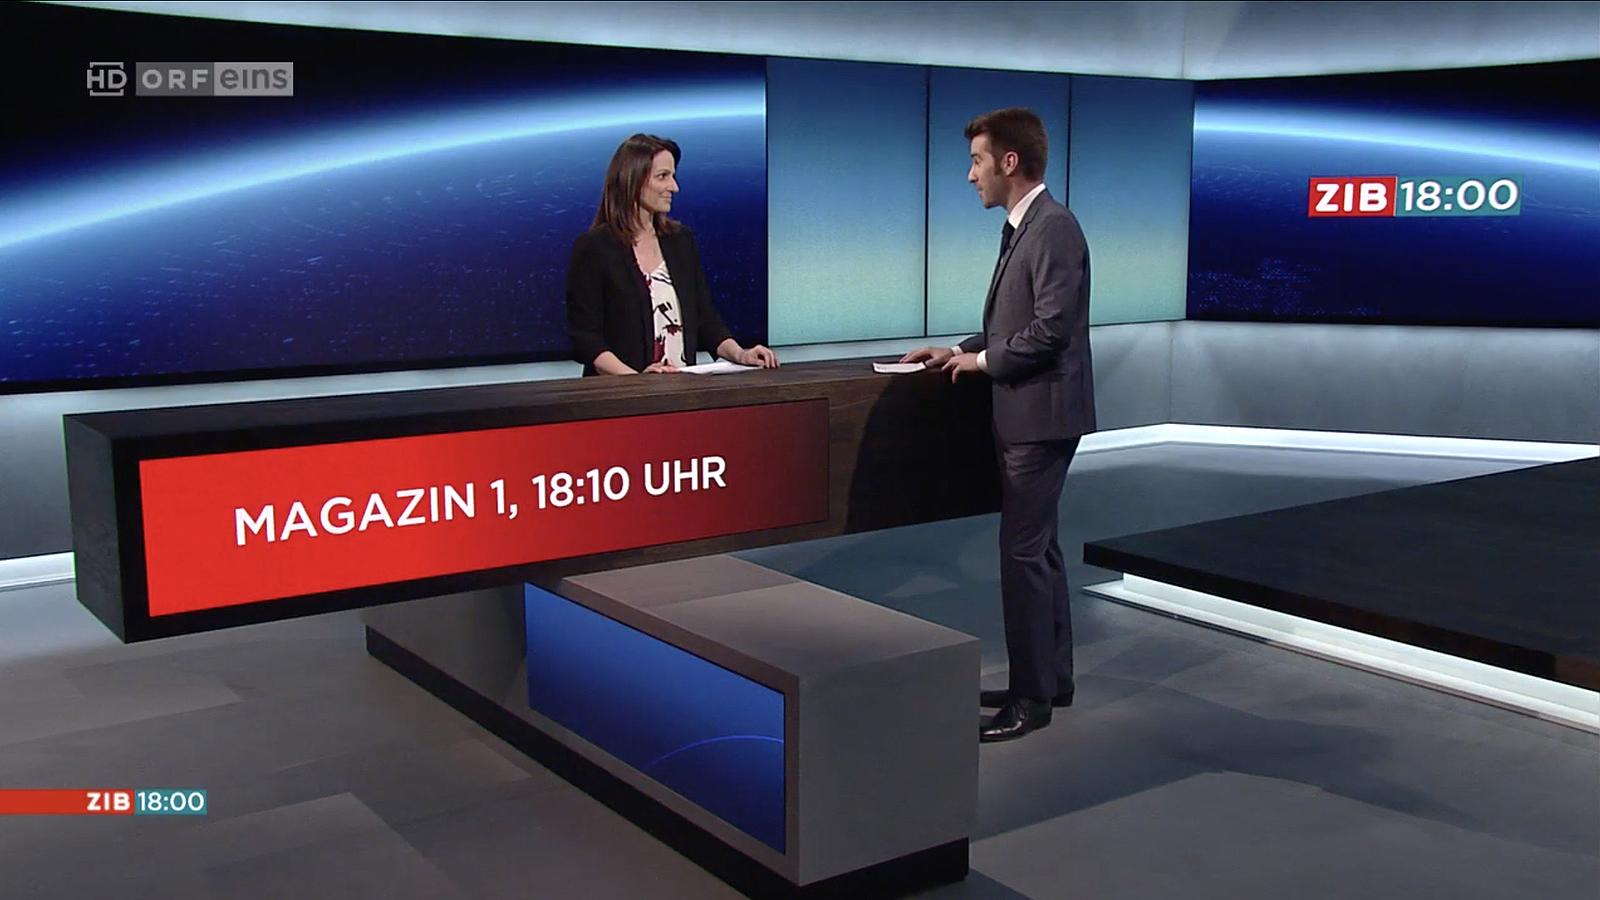 NCS_ORF-Veech-2019_0007